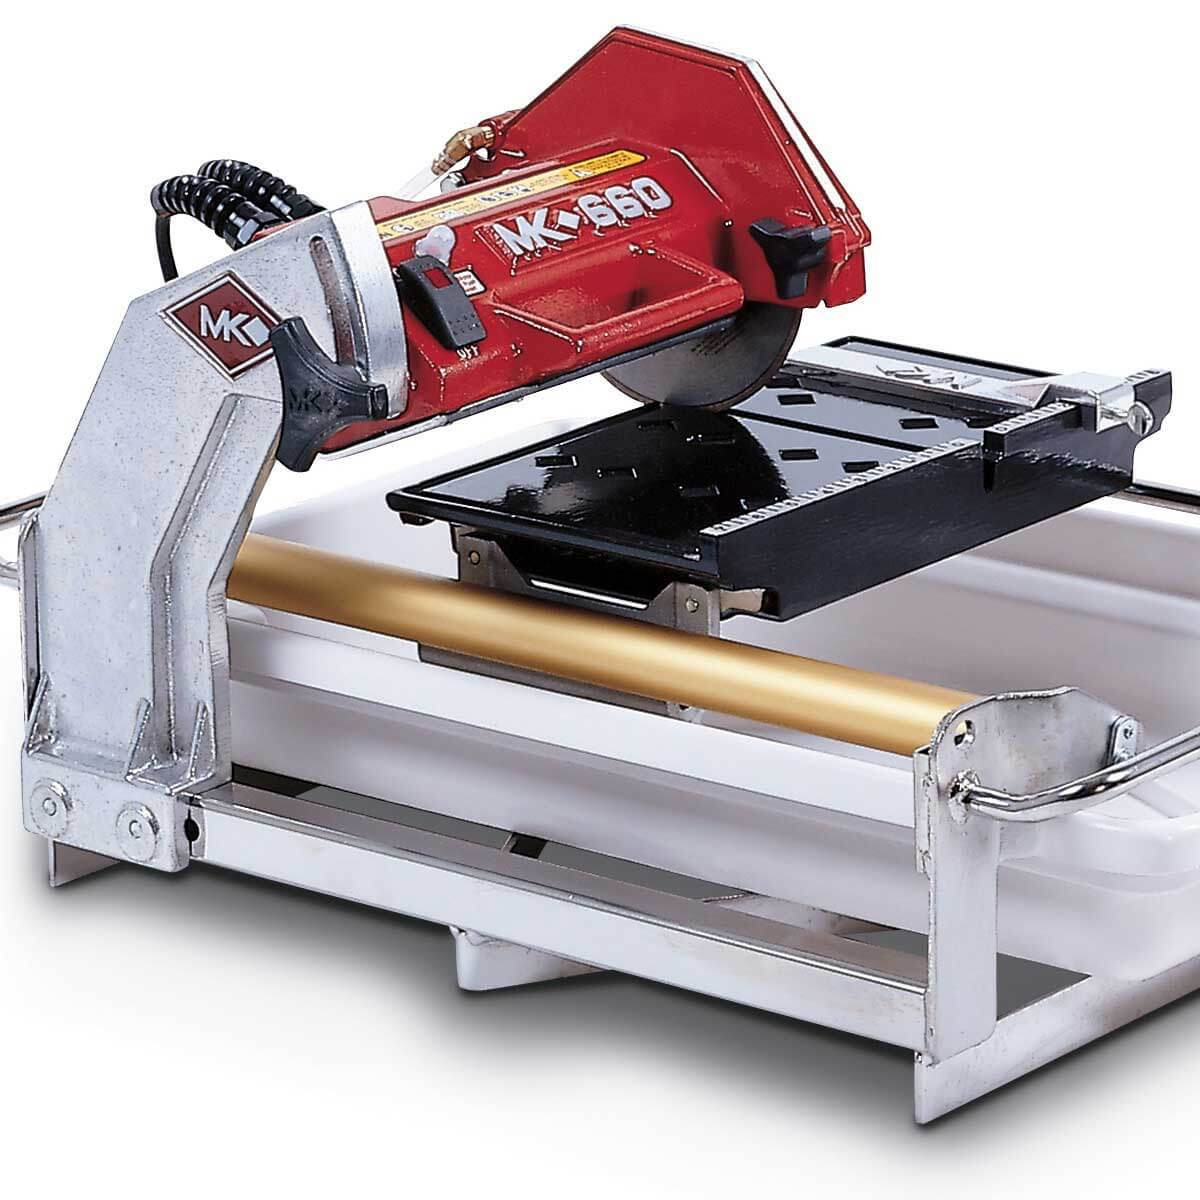 Mk Diamond Mk 660 Wet Tile Saw Contractors Direct